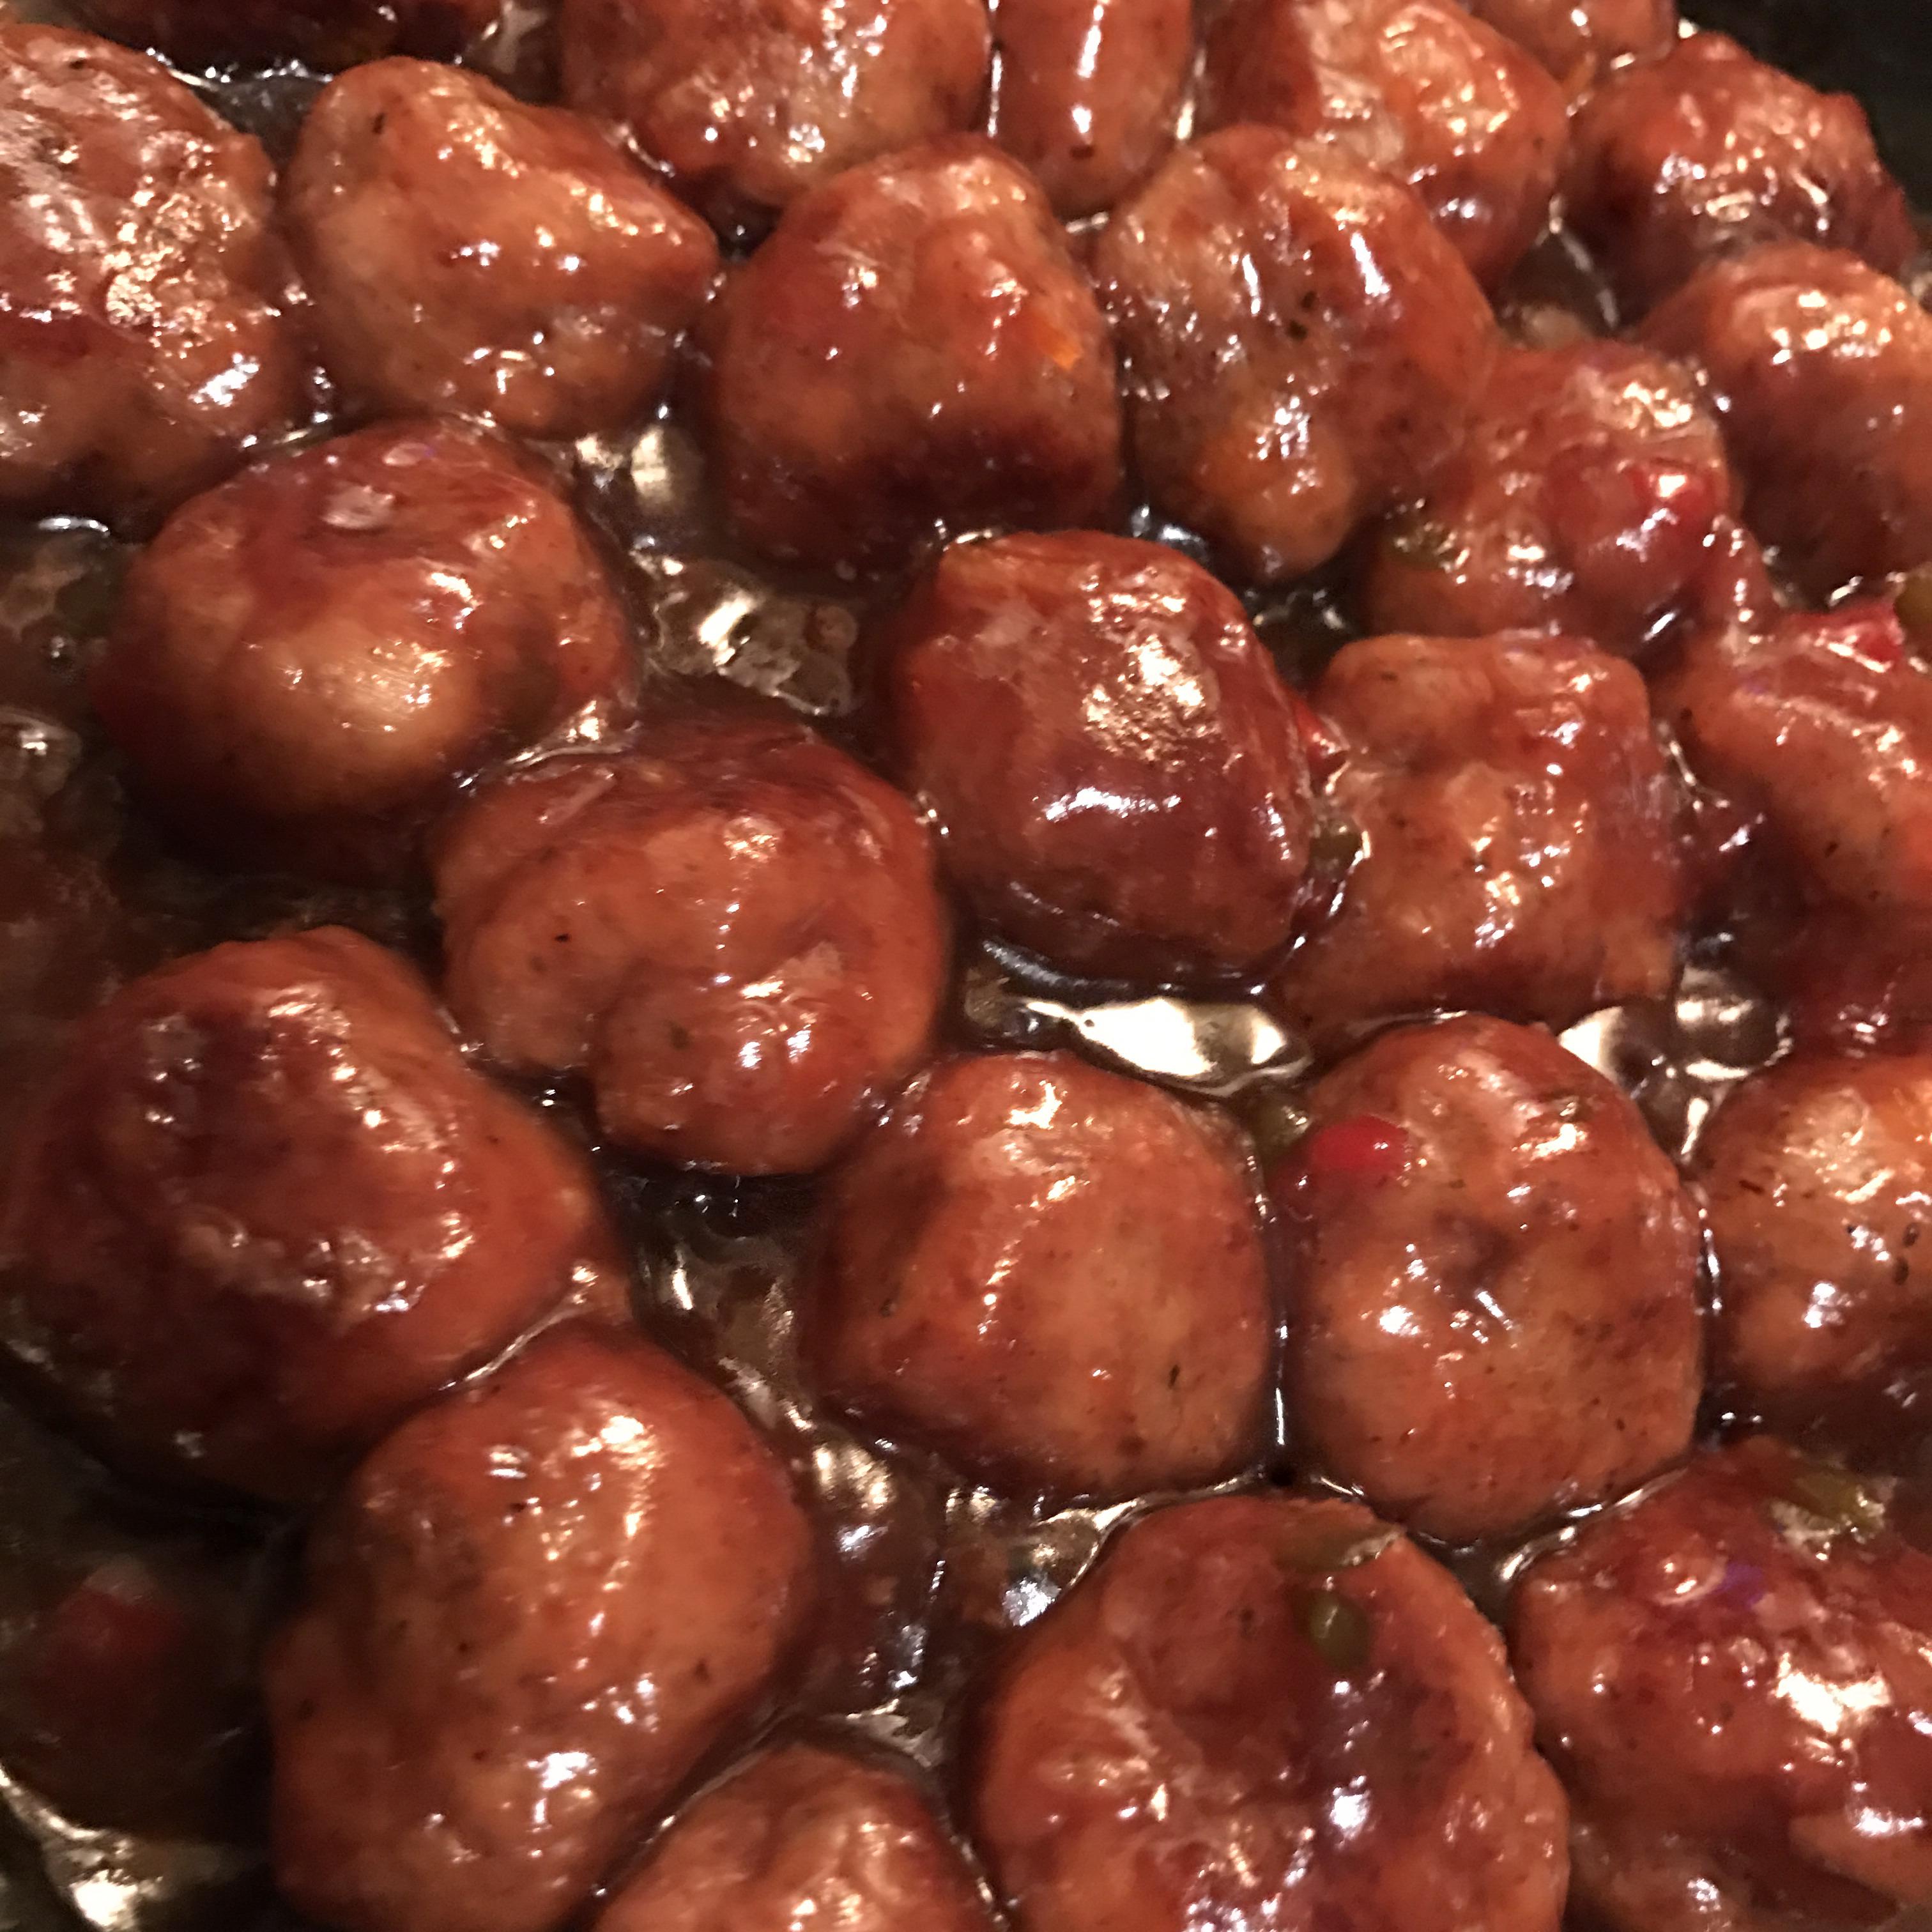 Turkey Cocktail Meatballs with Orange Cranberry Glaze